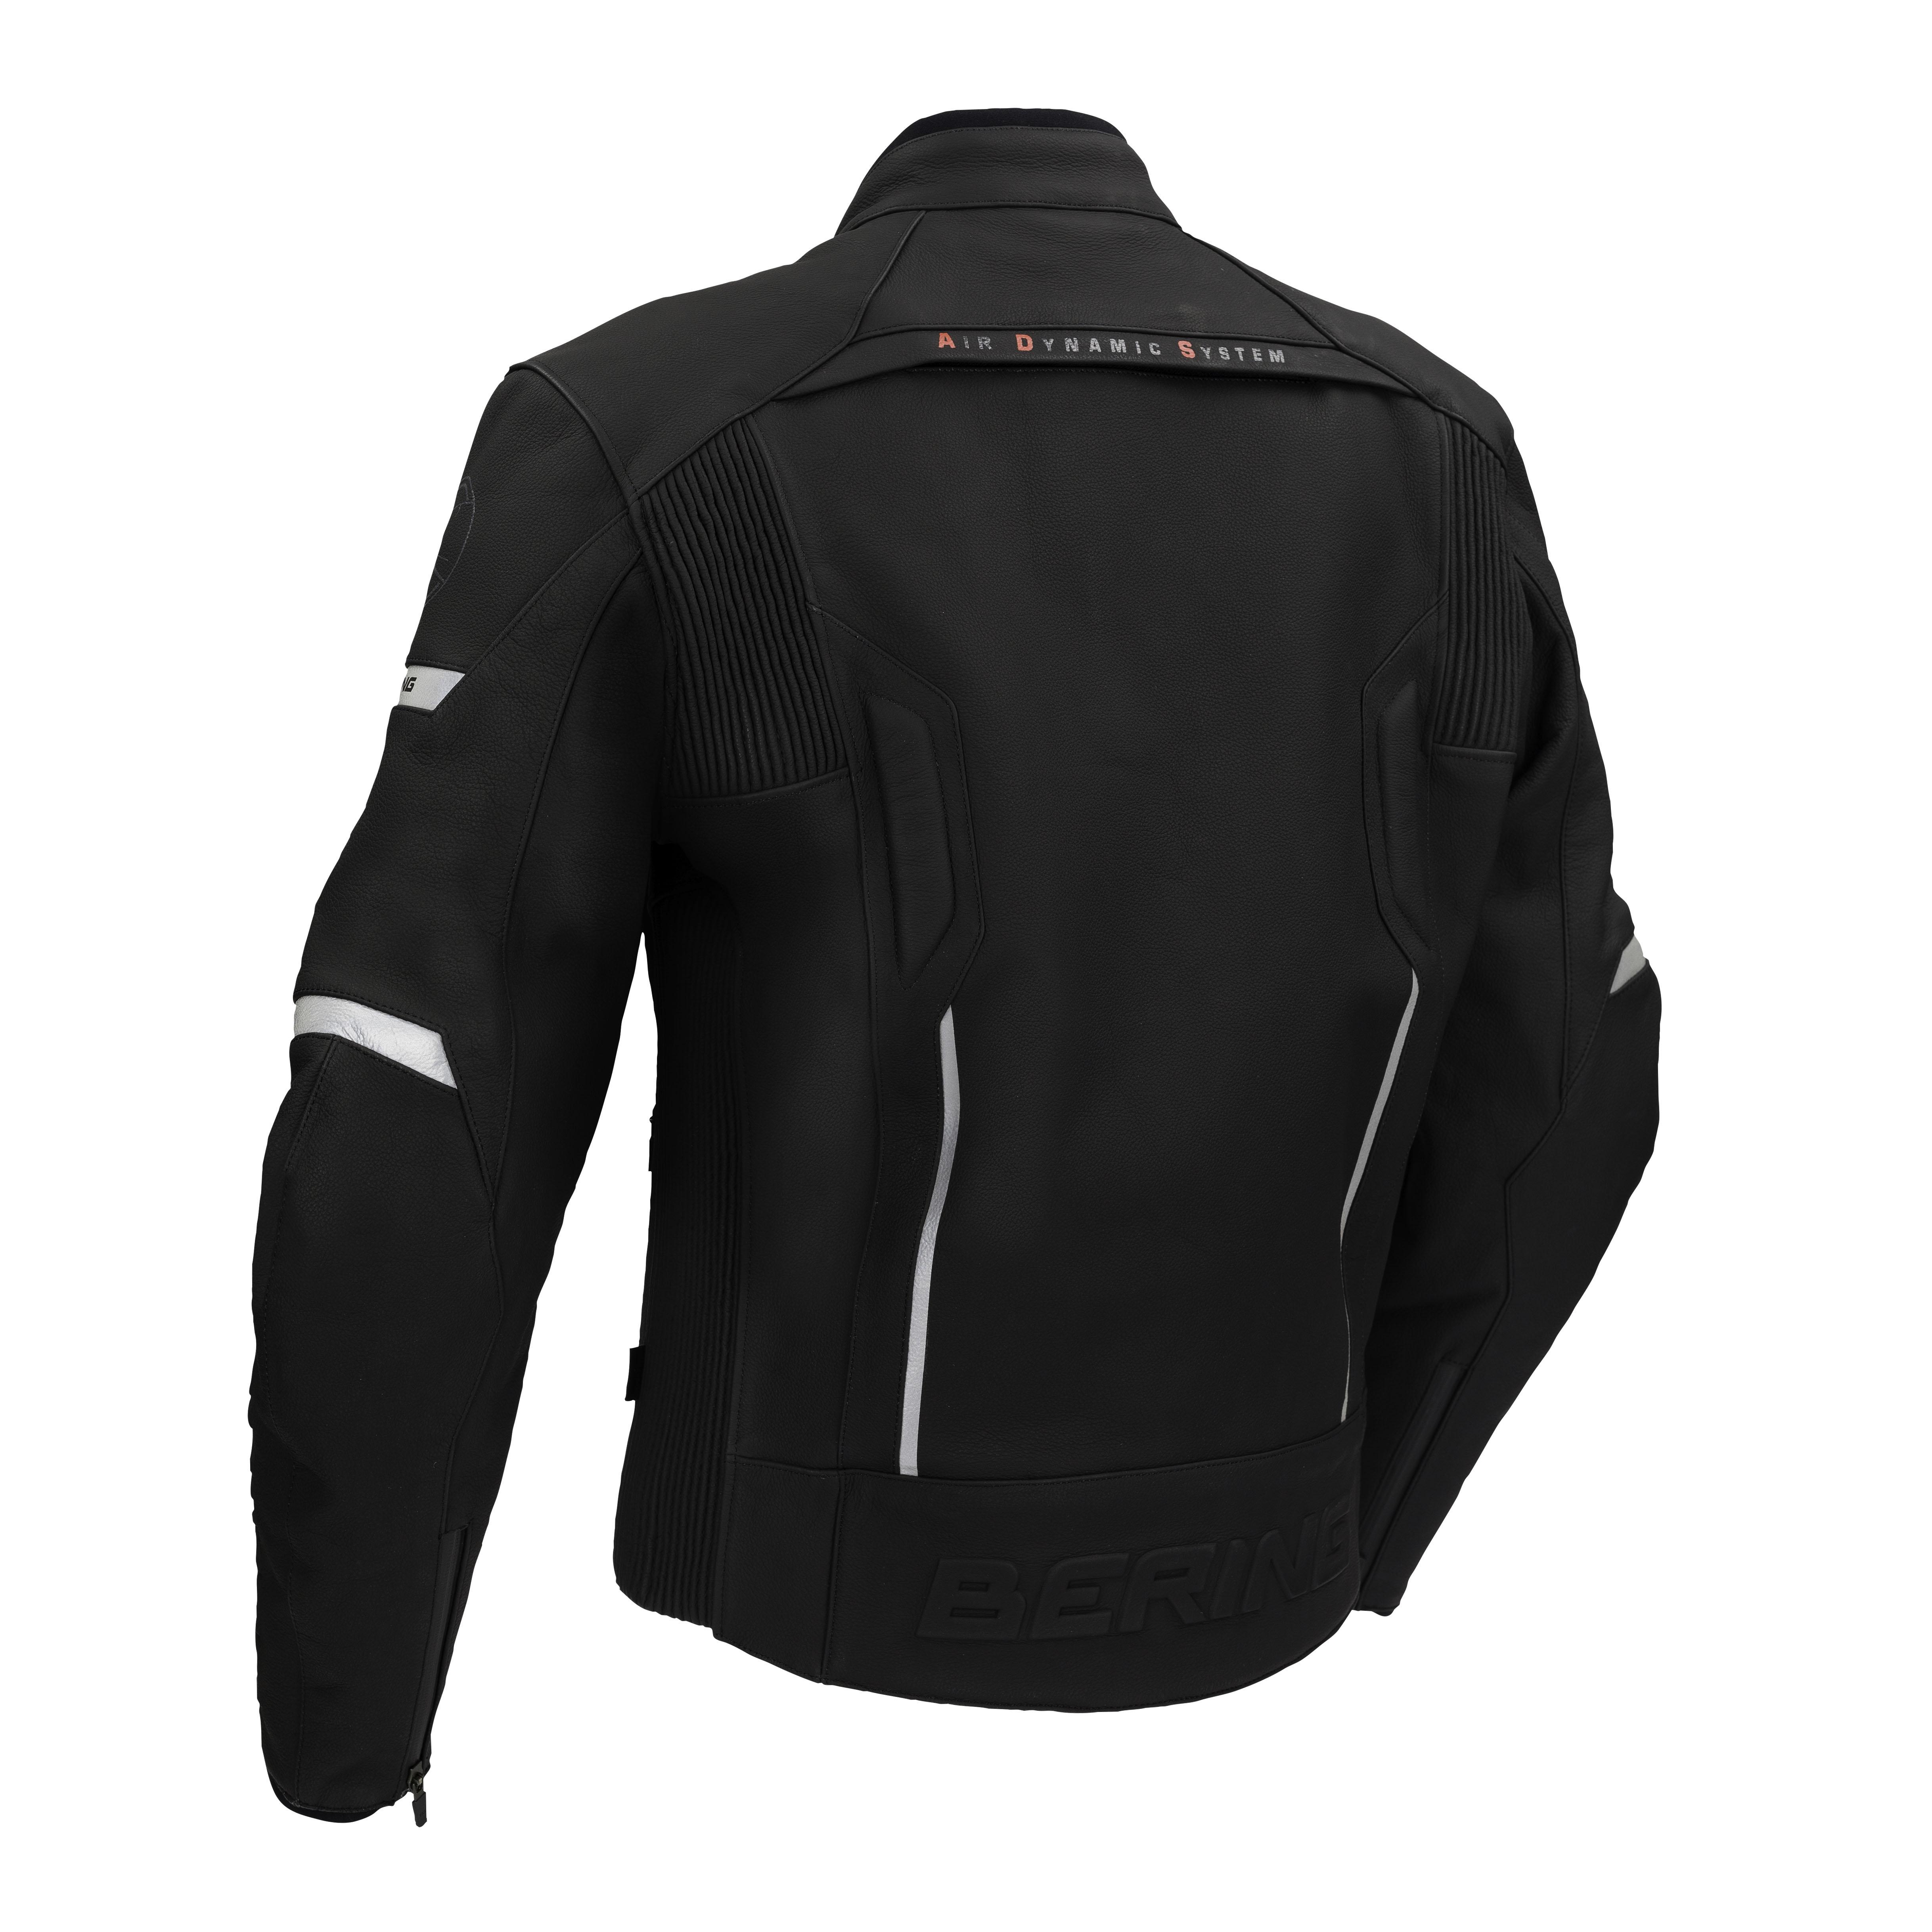 Hanson - BCB240 - Bőrdzseki - Bering motoros ruházat - Fokt Motor Online 0b0ca98ef4